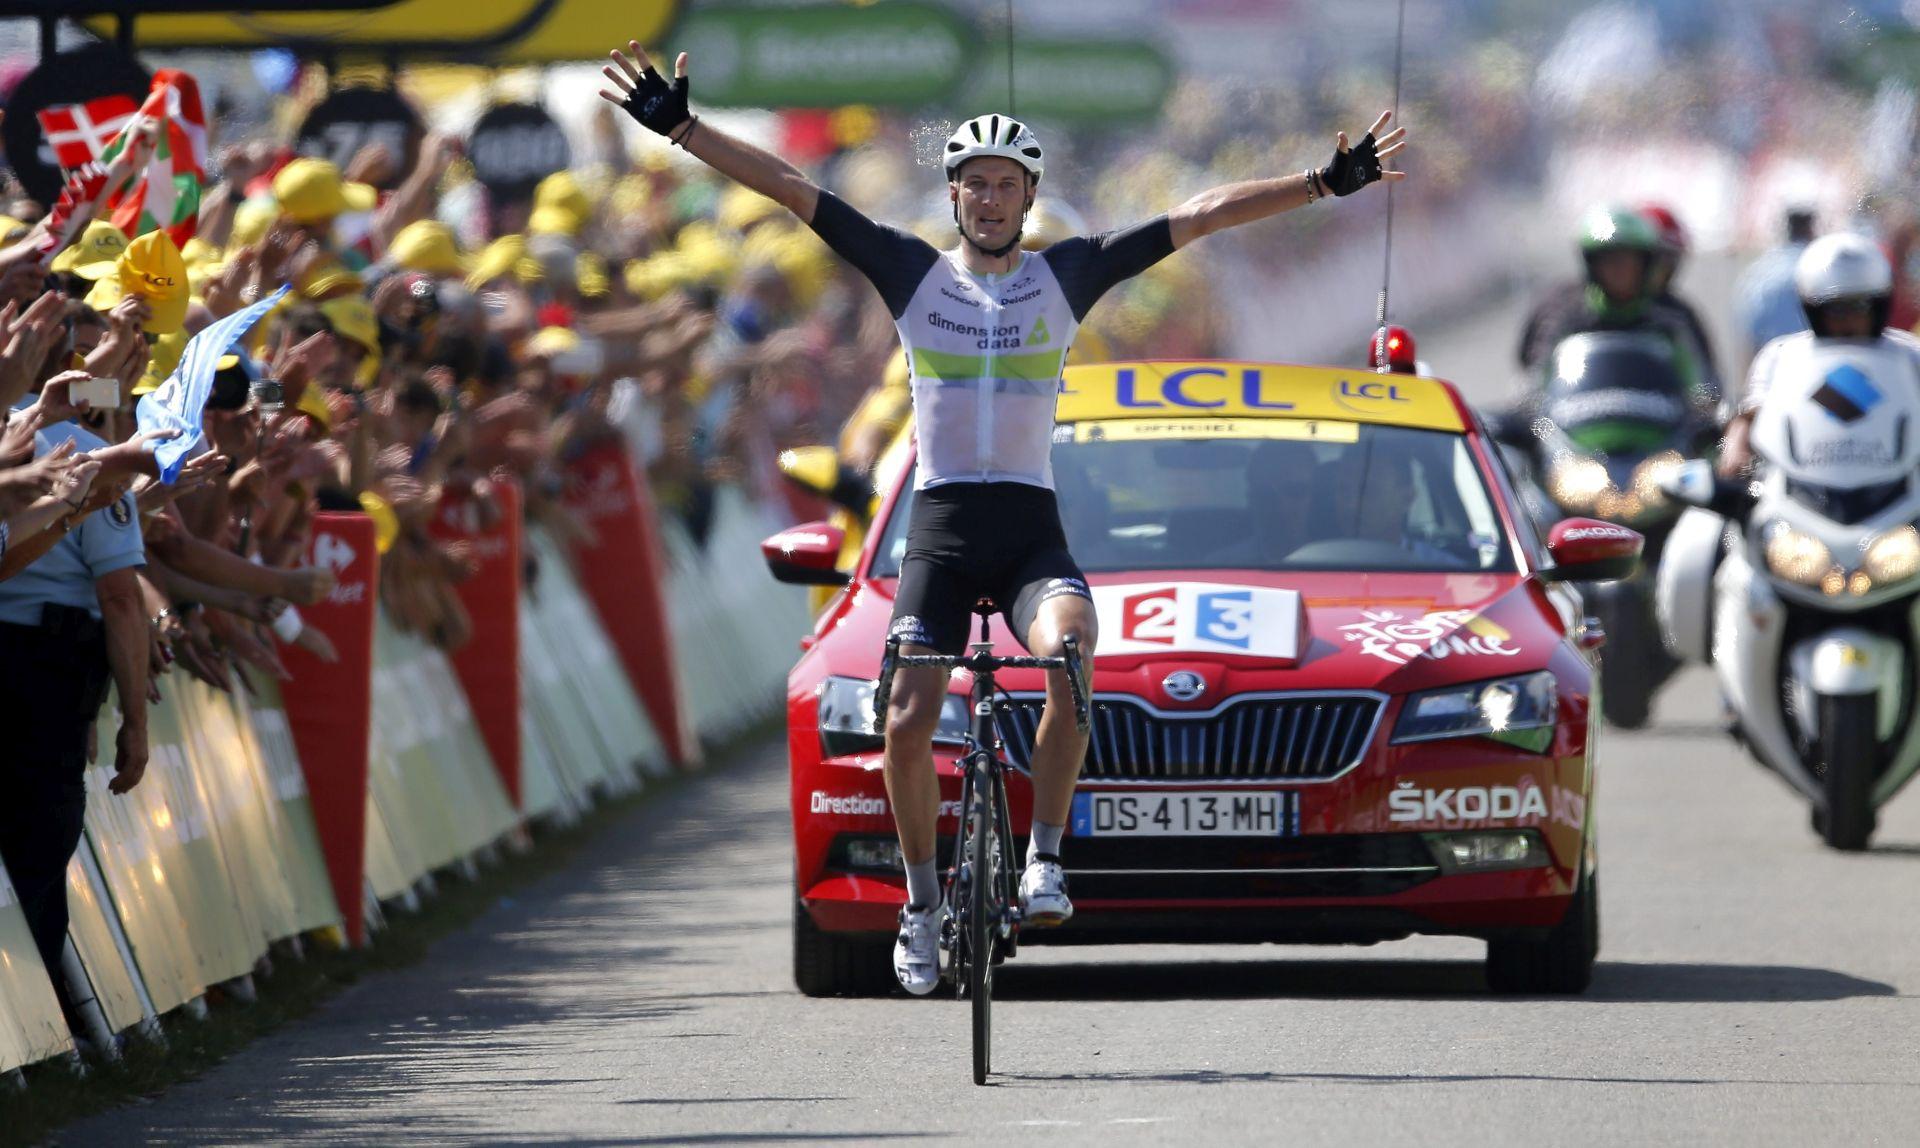 TOUR DE FRANCE: Stephen Cummings osvojio sedmu etapu